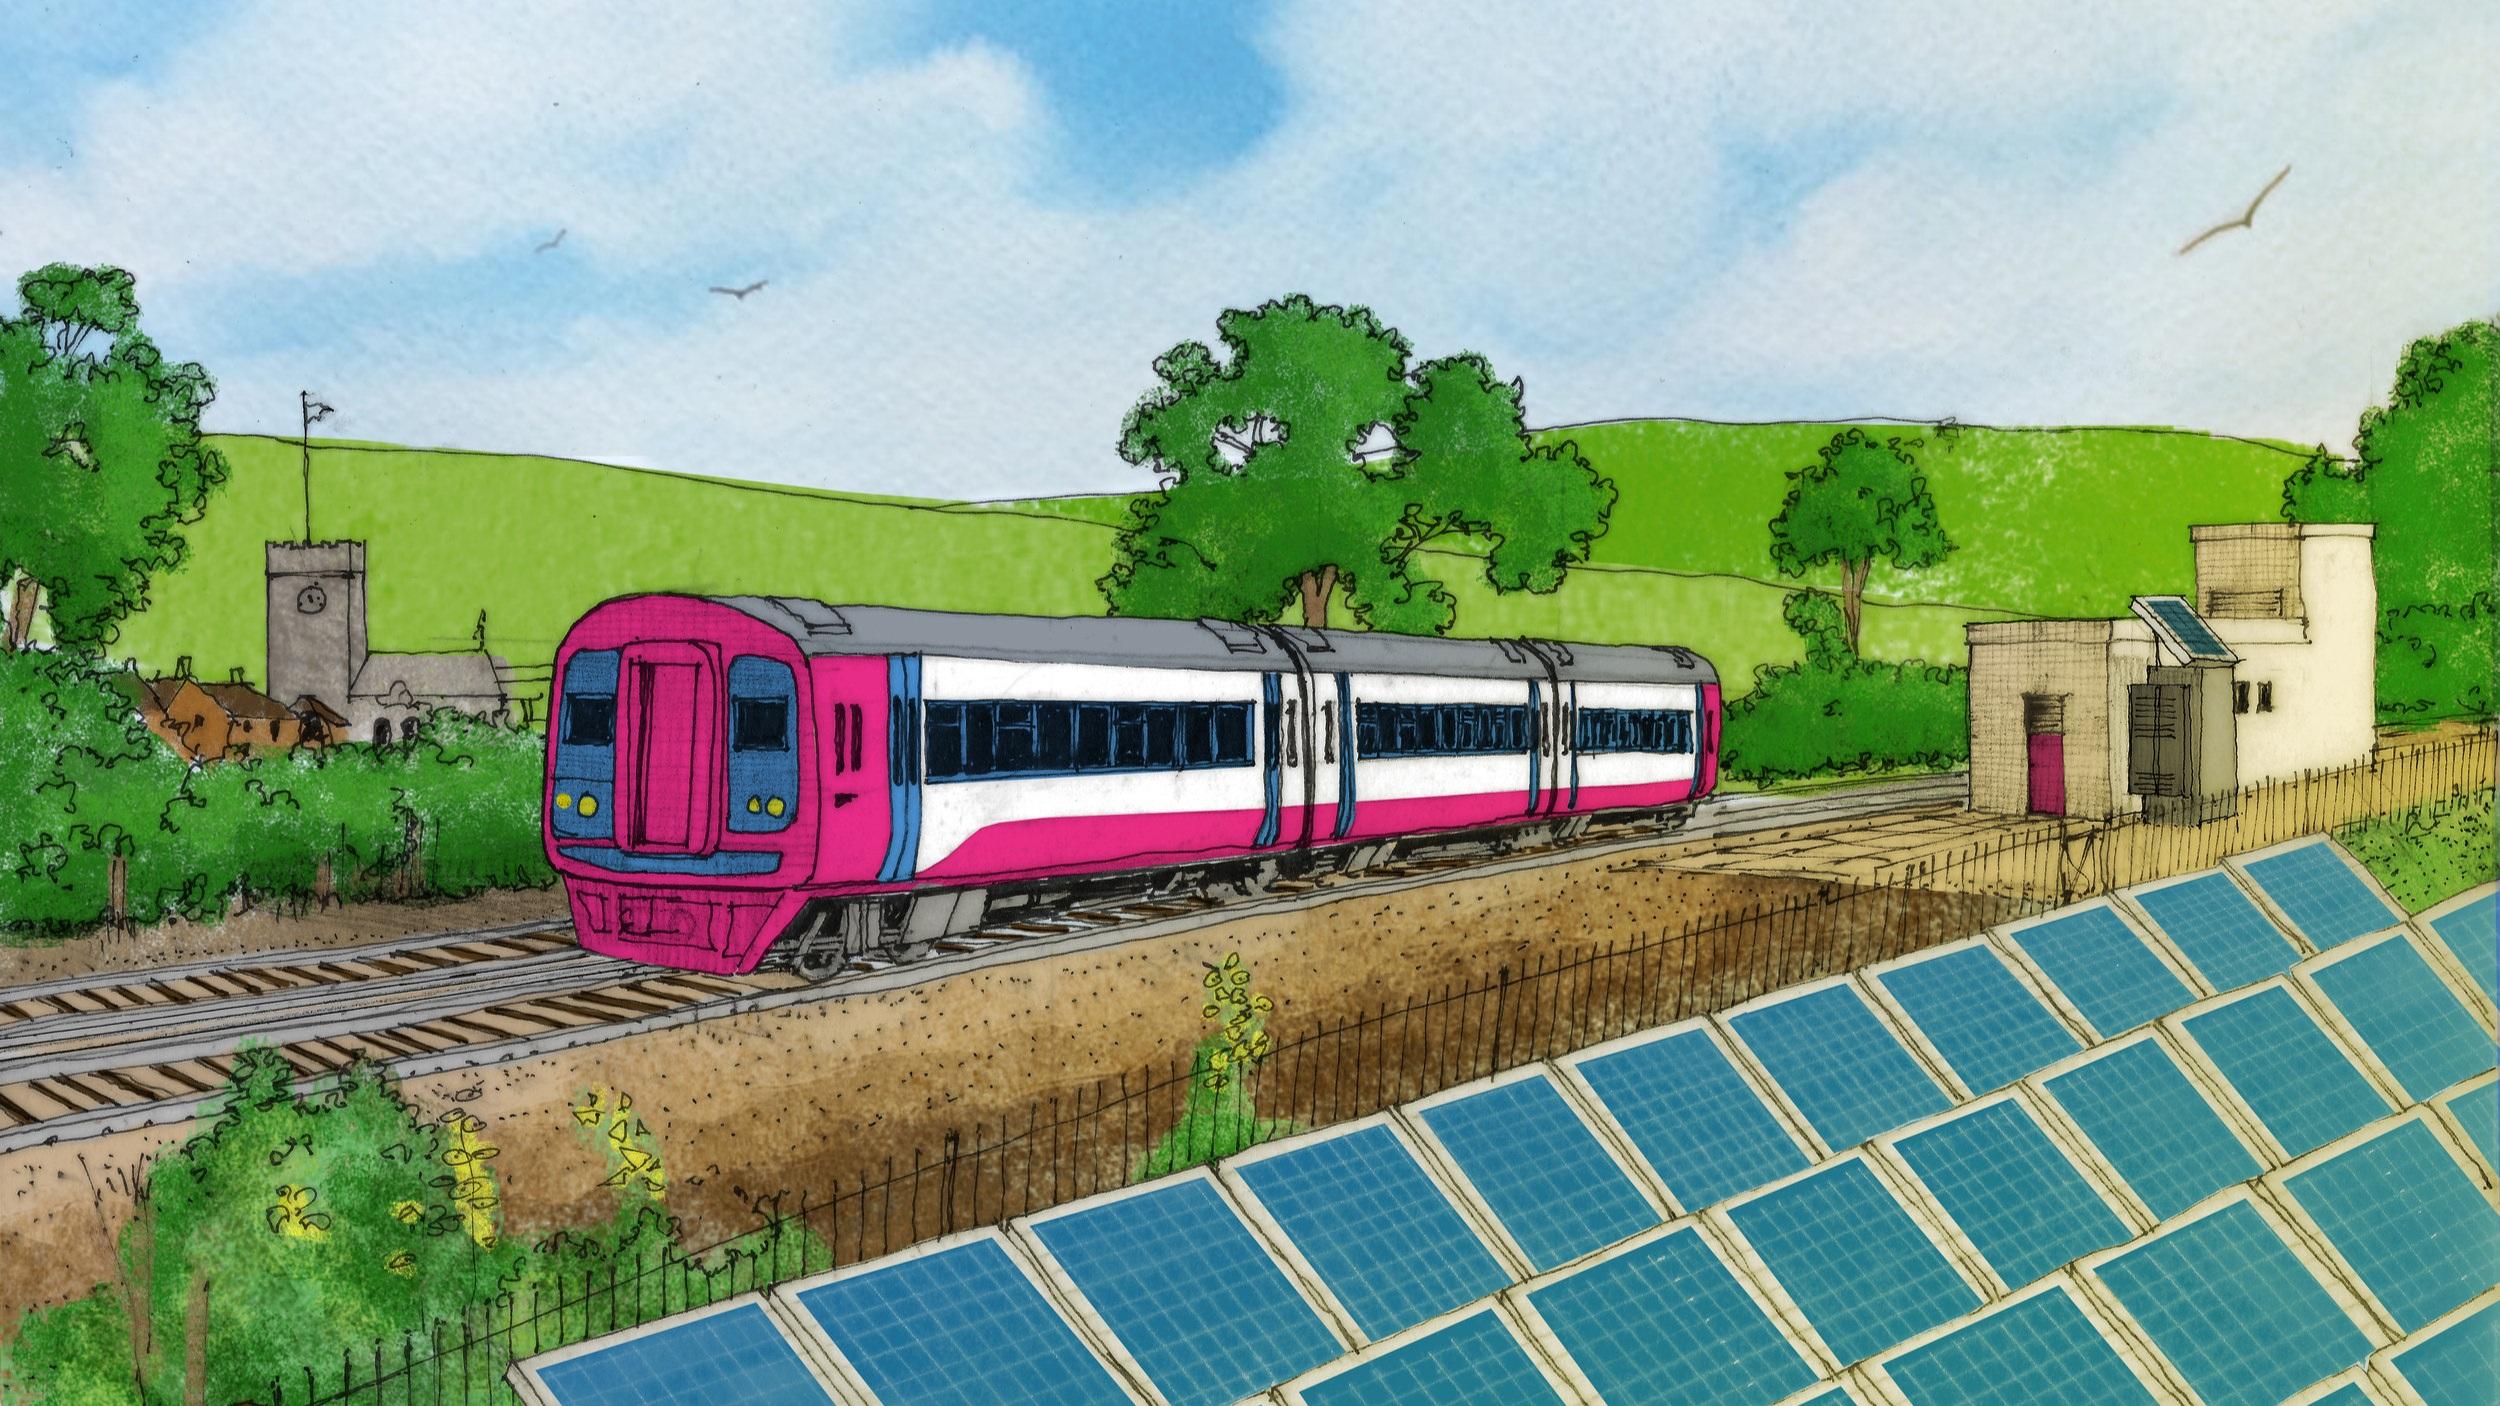 train illustration. Link: Riding sunbeams